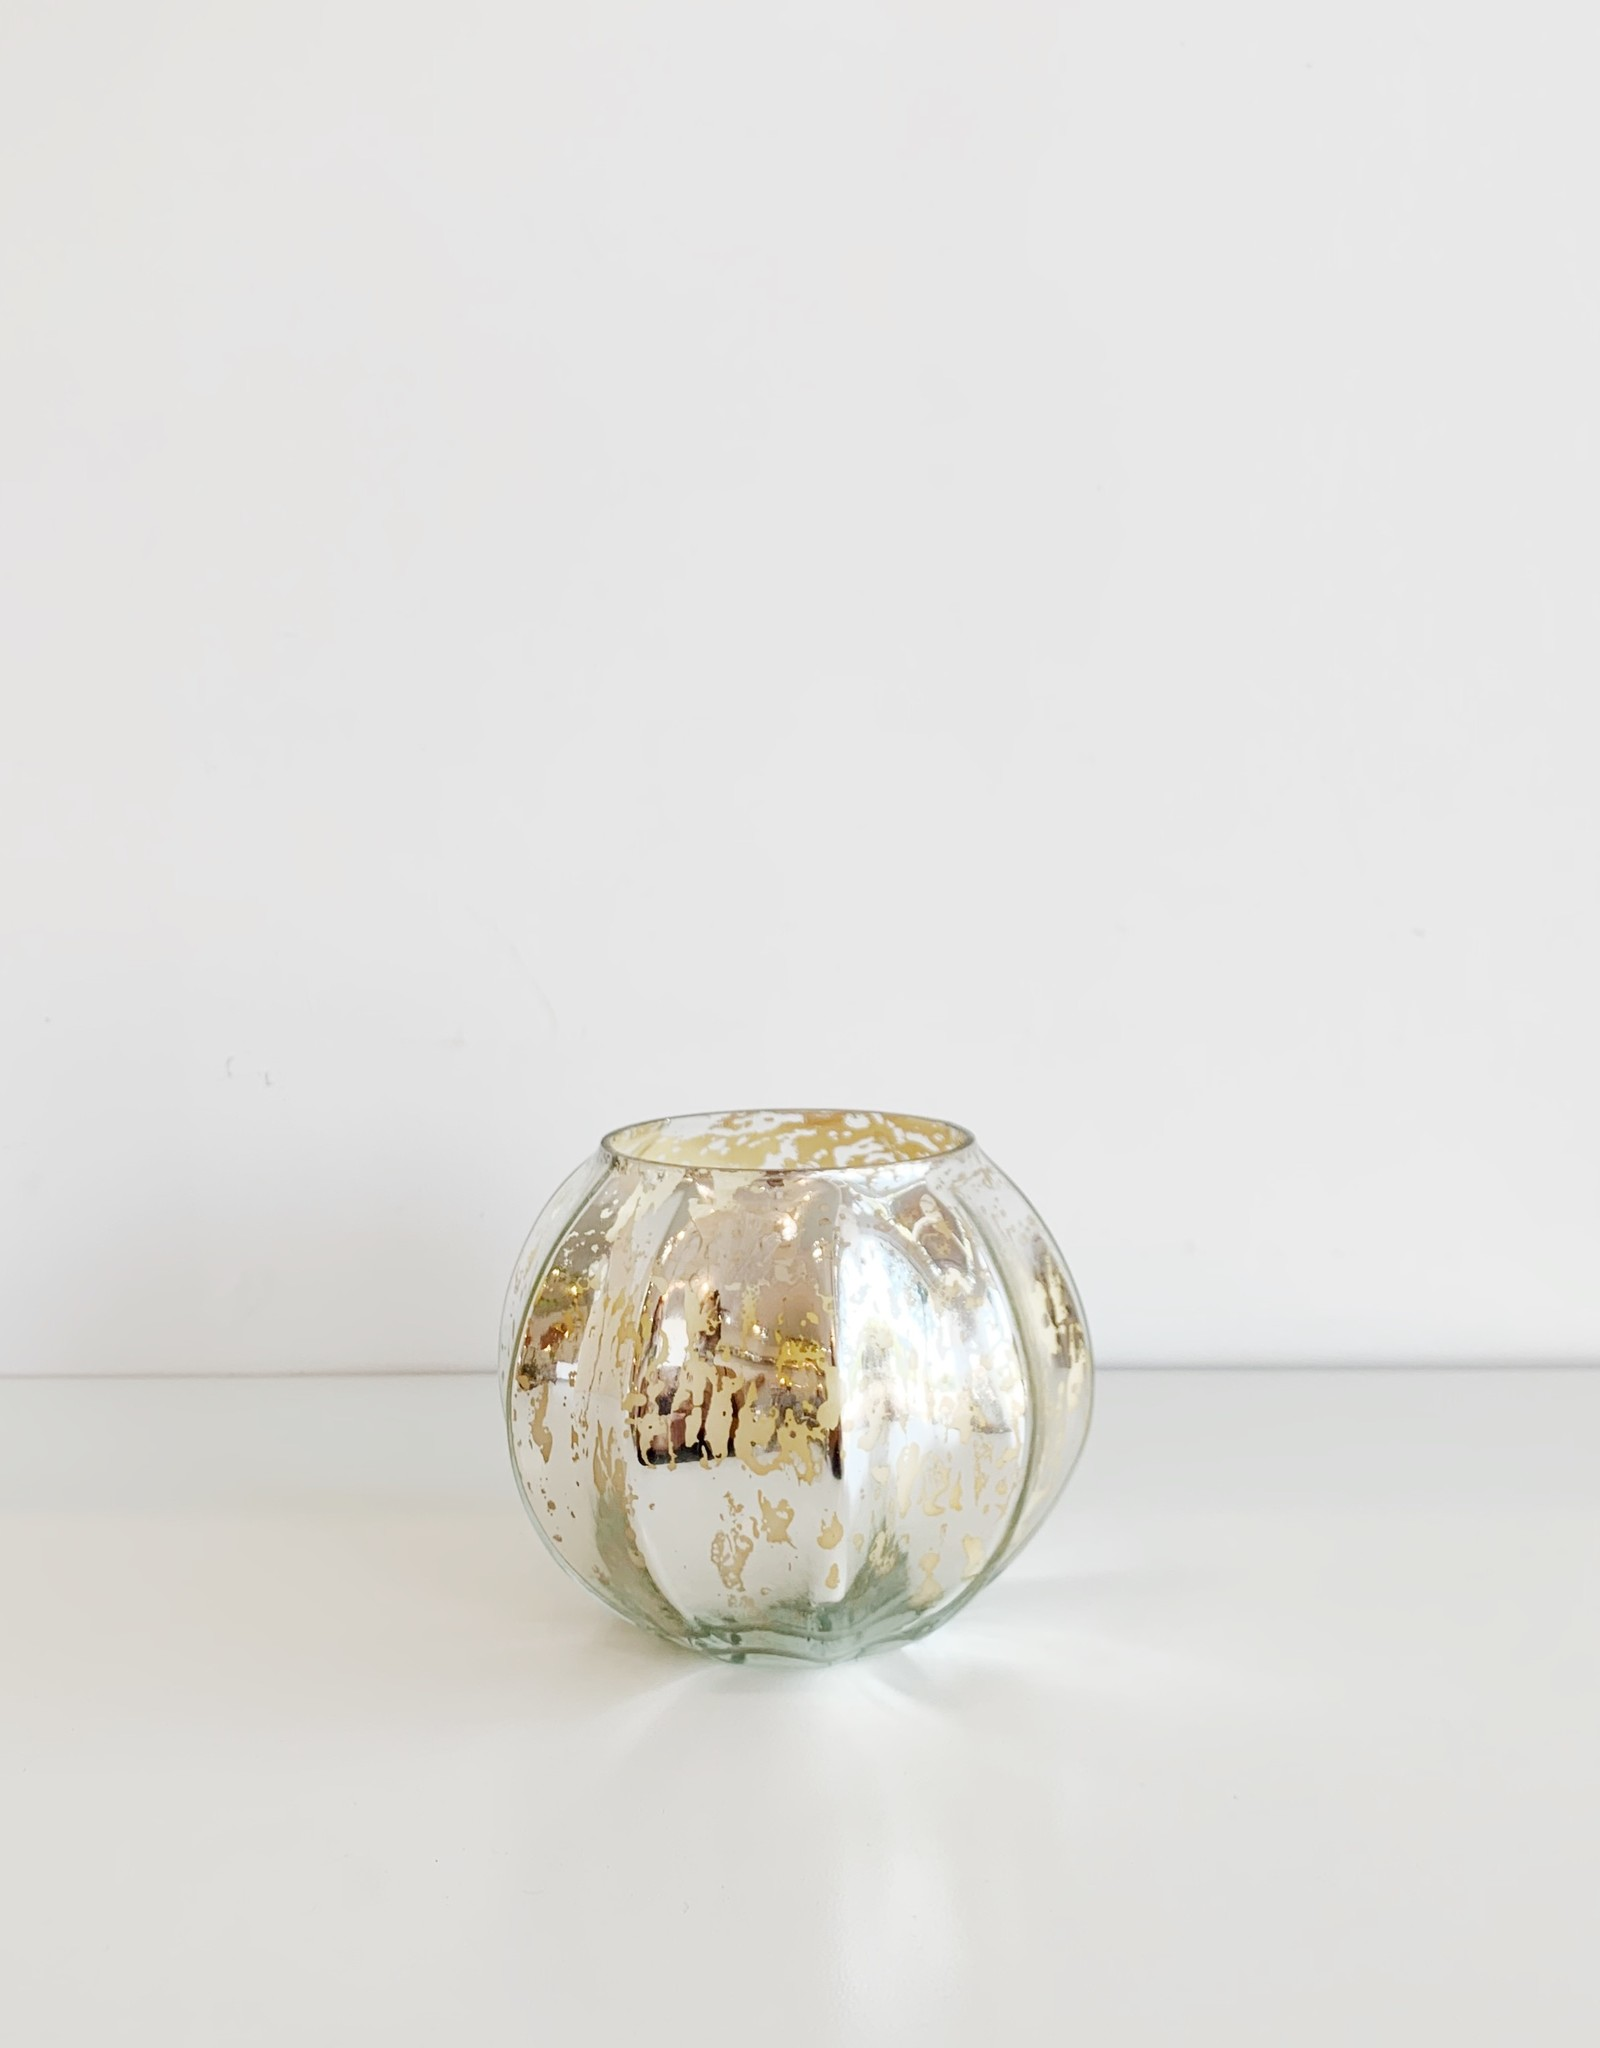 Autumn Sage Mercury Leaves Candle